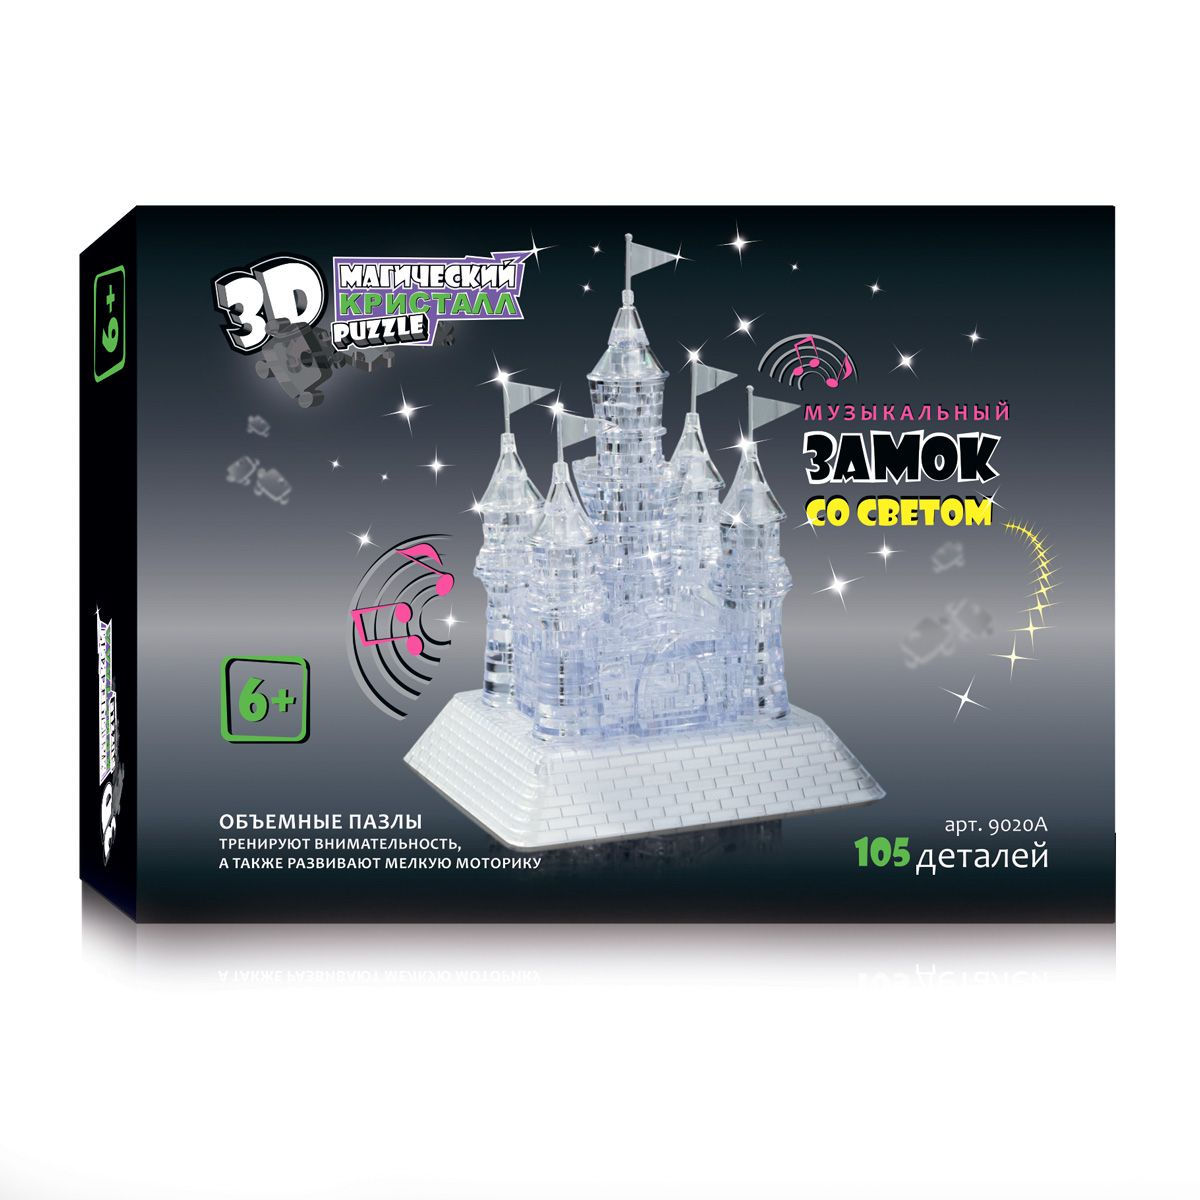 3D Puzzle Магический Кристалл 3D Пазл Замок со светом и музыкой кристальный пазл 3d crystal puzzle замок